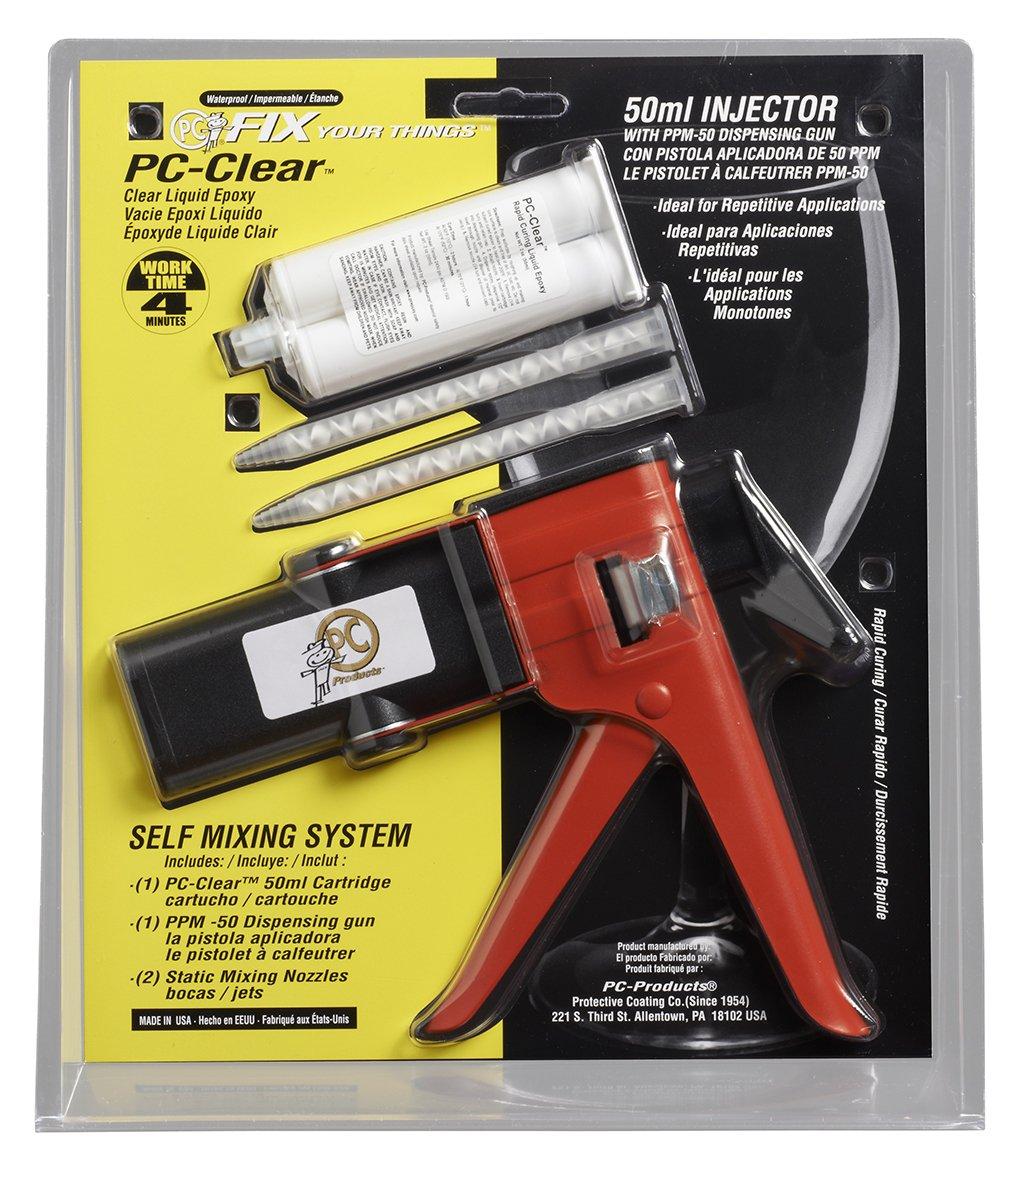 PC Products PC-Clear Epoxy Adhesive Liquid Kit, 50ml Cartridge & PPM-50 Dispensing Gun, Clear 75036